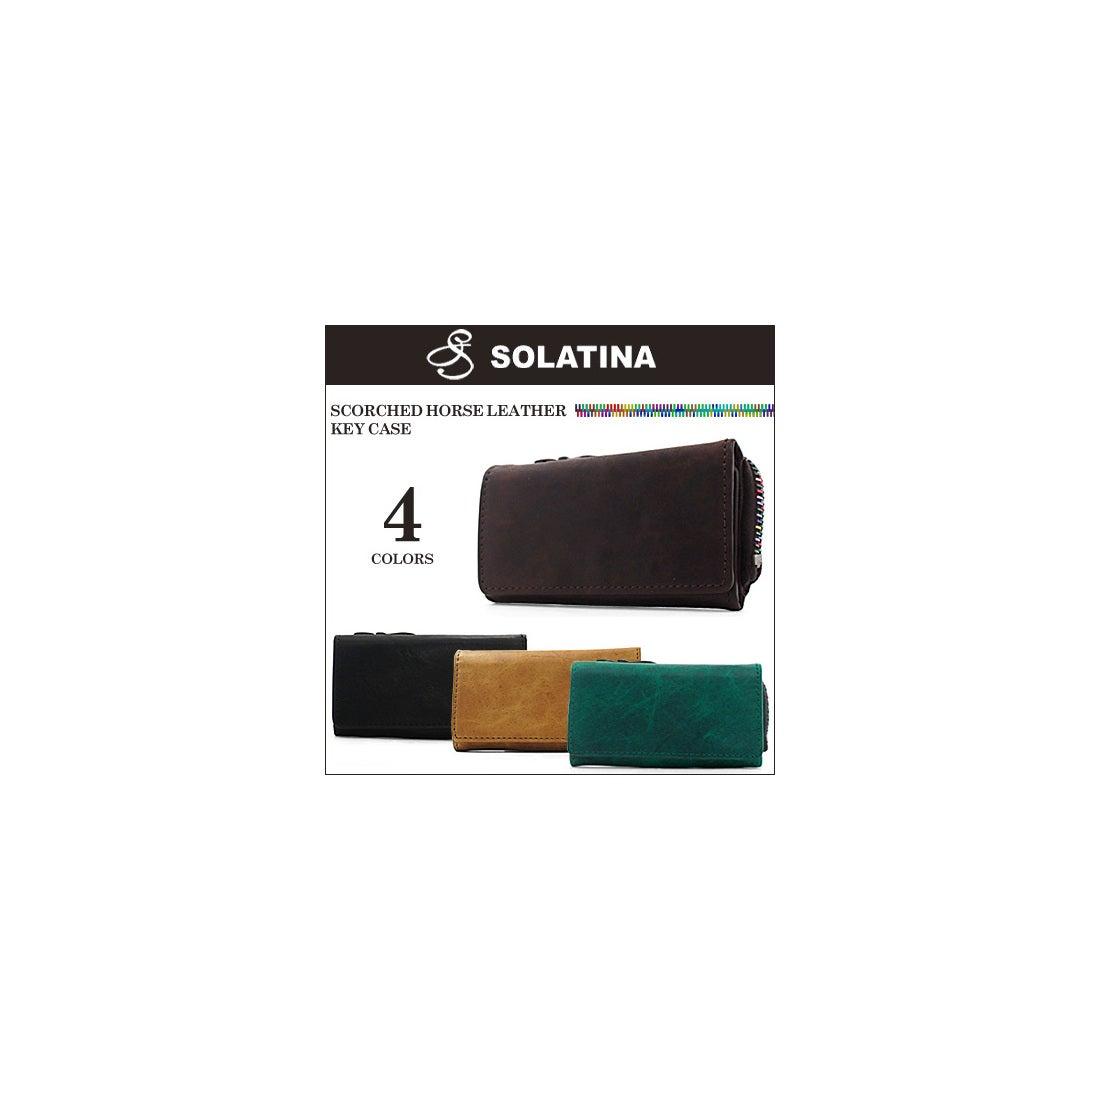 【SAC'S BAR】SOLATINA ソラチナ キーケース 38154 焦げ加工ホースレザー キーケース 全4色 CAMEL メンズ